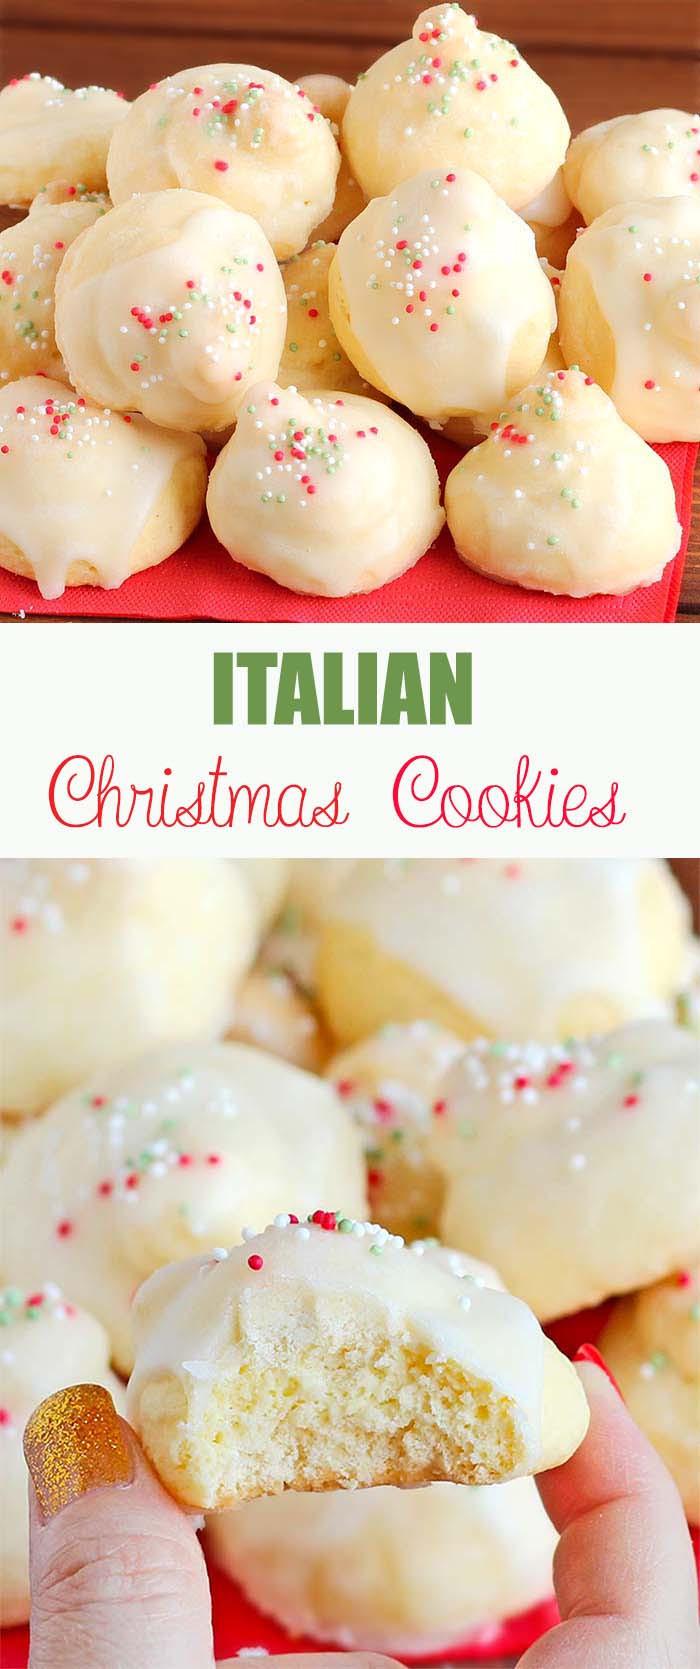 Italian Christmas Cookies Recipe  Italian Christmas Cookies Cakescottage